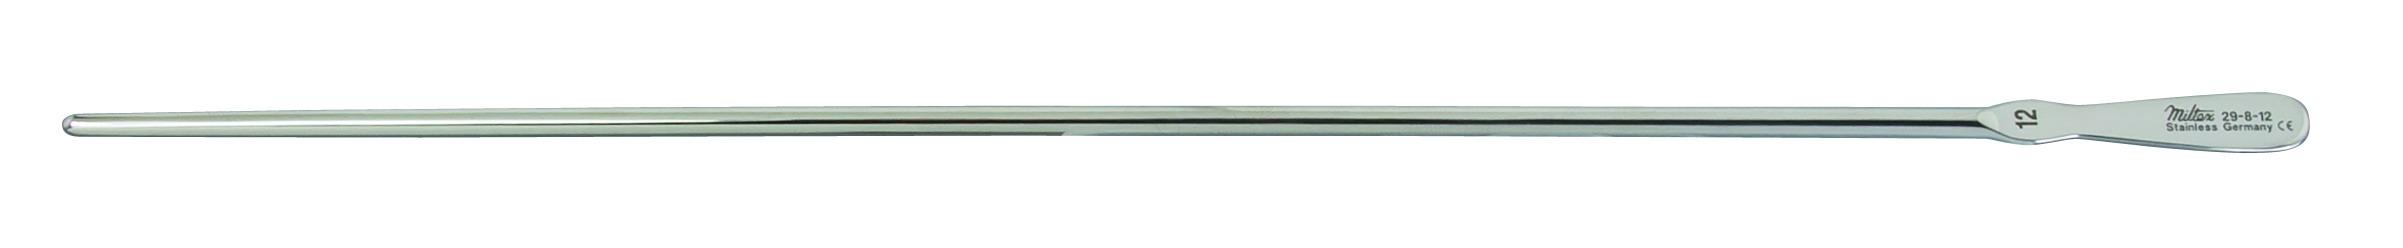 dittel-urethral-sound-11-1-2-292-cm-straight-12-fr-4-m-29-8-12-miltex.jpg